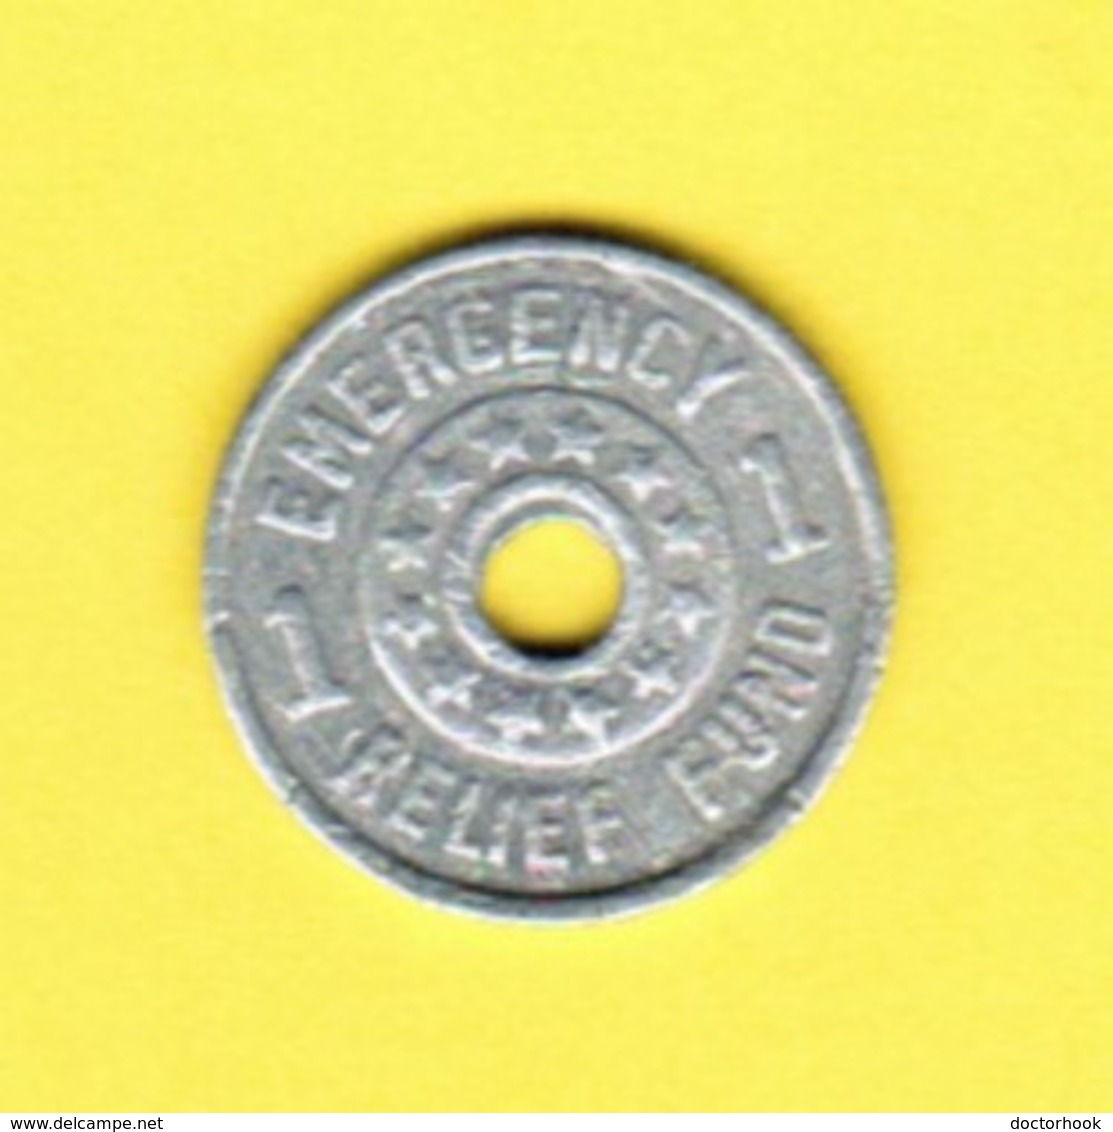 U.S.A.    UTAH EMERGENCY RELIEF FUND SALES TAX Token (T-17) - USA